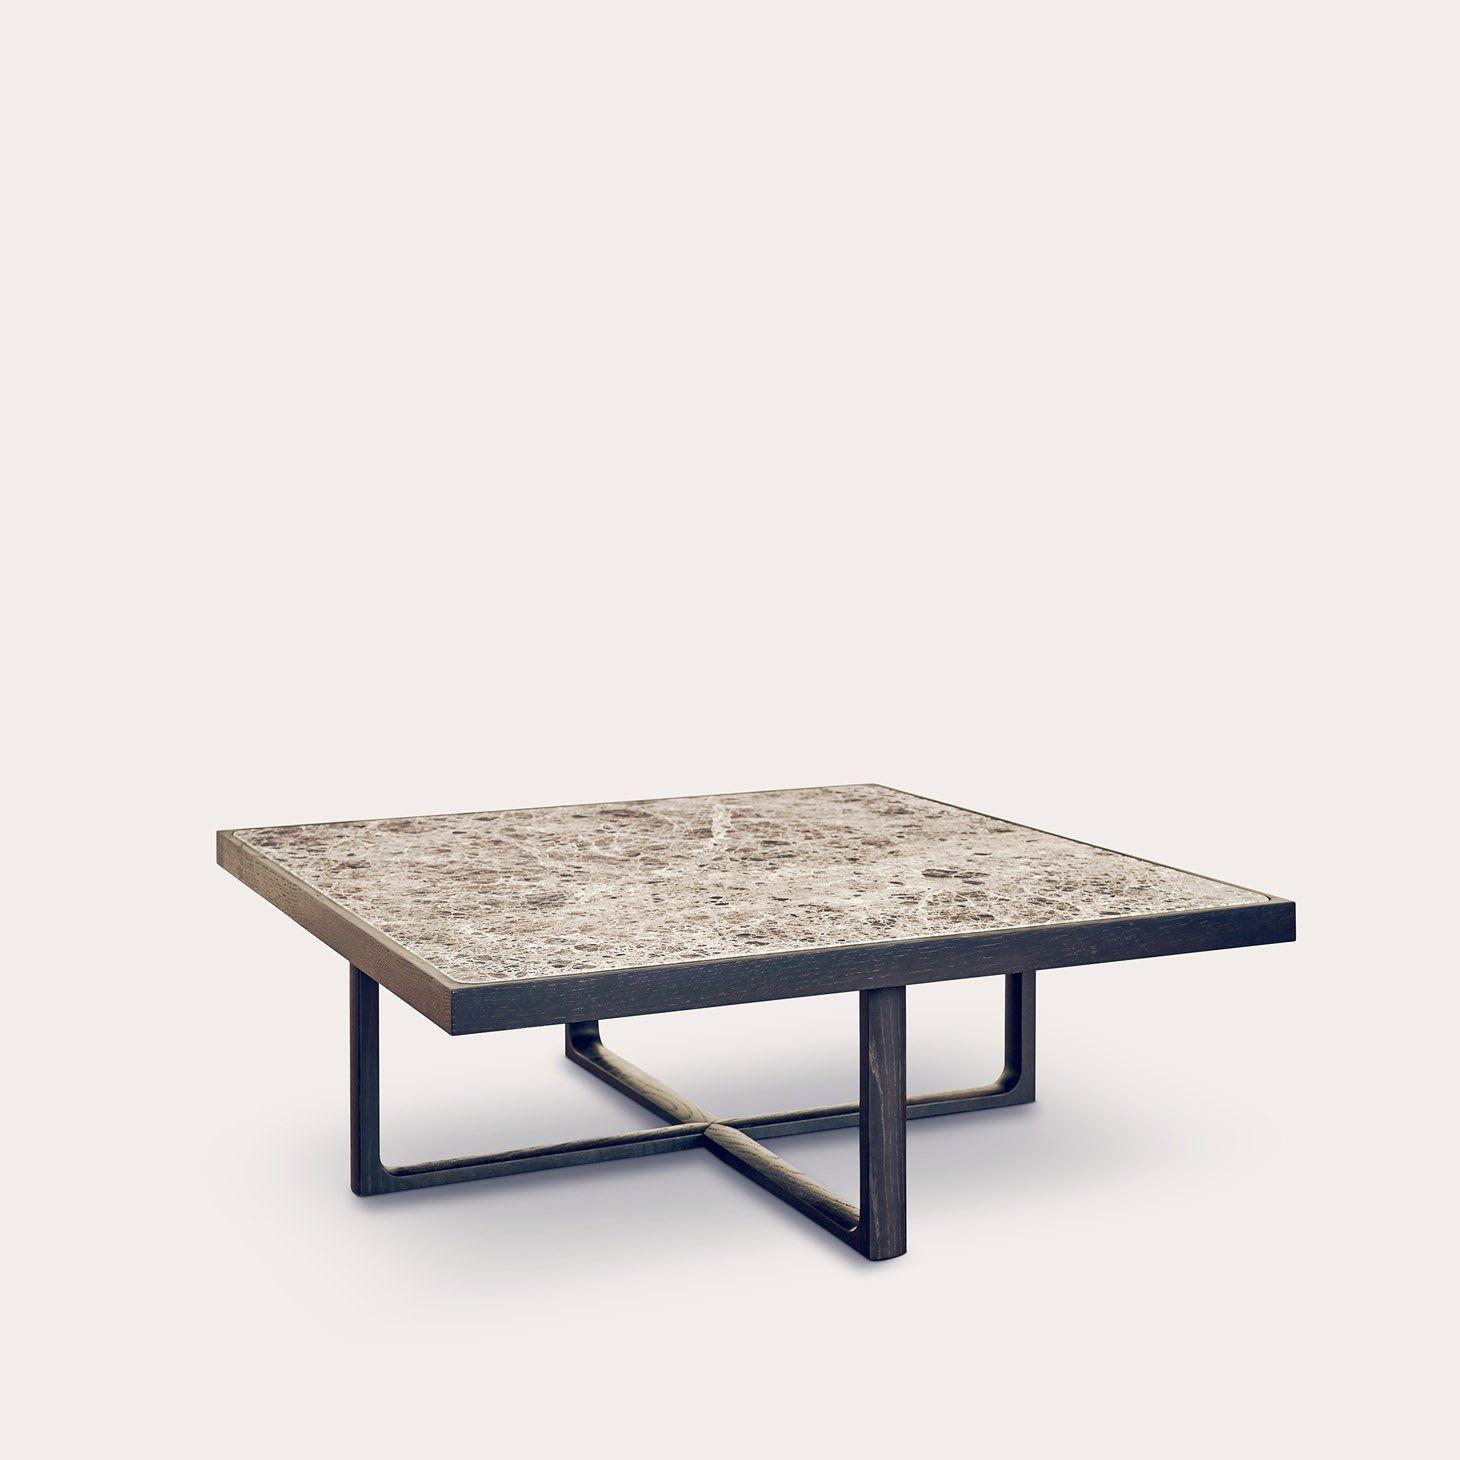 Palais Tables Marco Dessi Designer Furniture Sku 758 230 10034 Coffee Table Furniture Design Table [ 1460 x 1460 Pixel ]